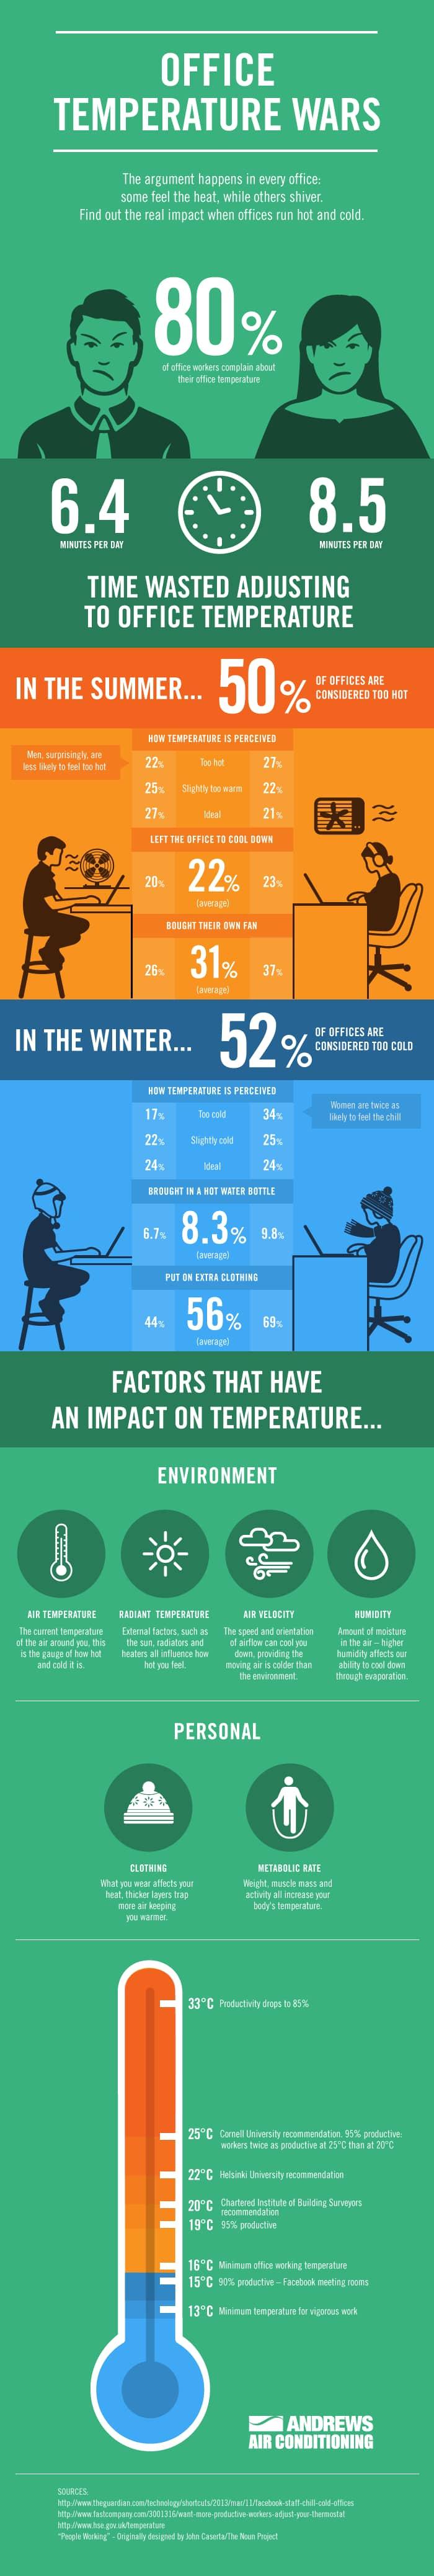 Office Temperature Wars